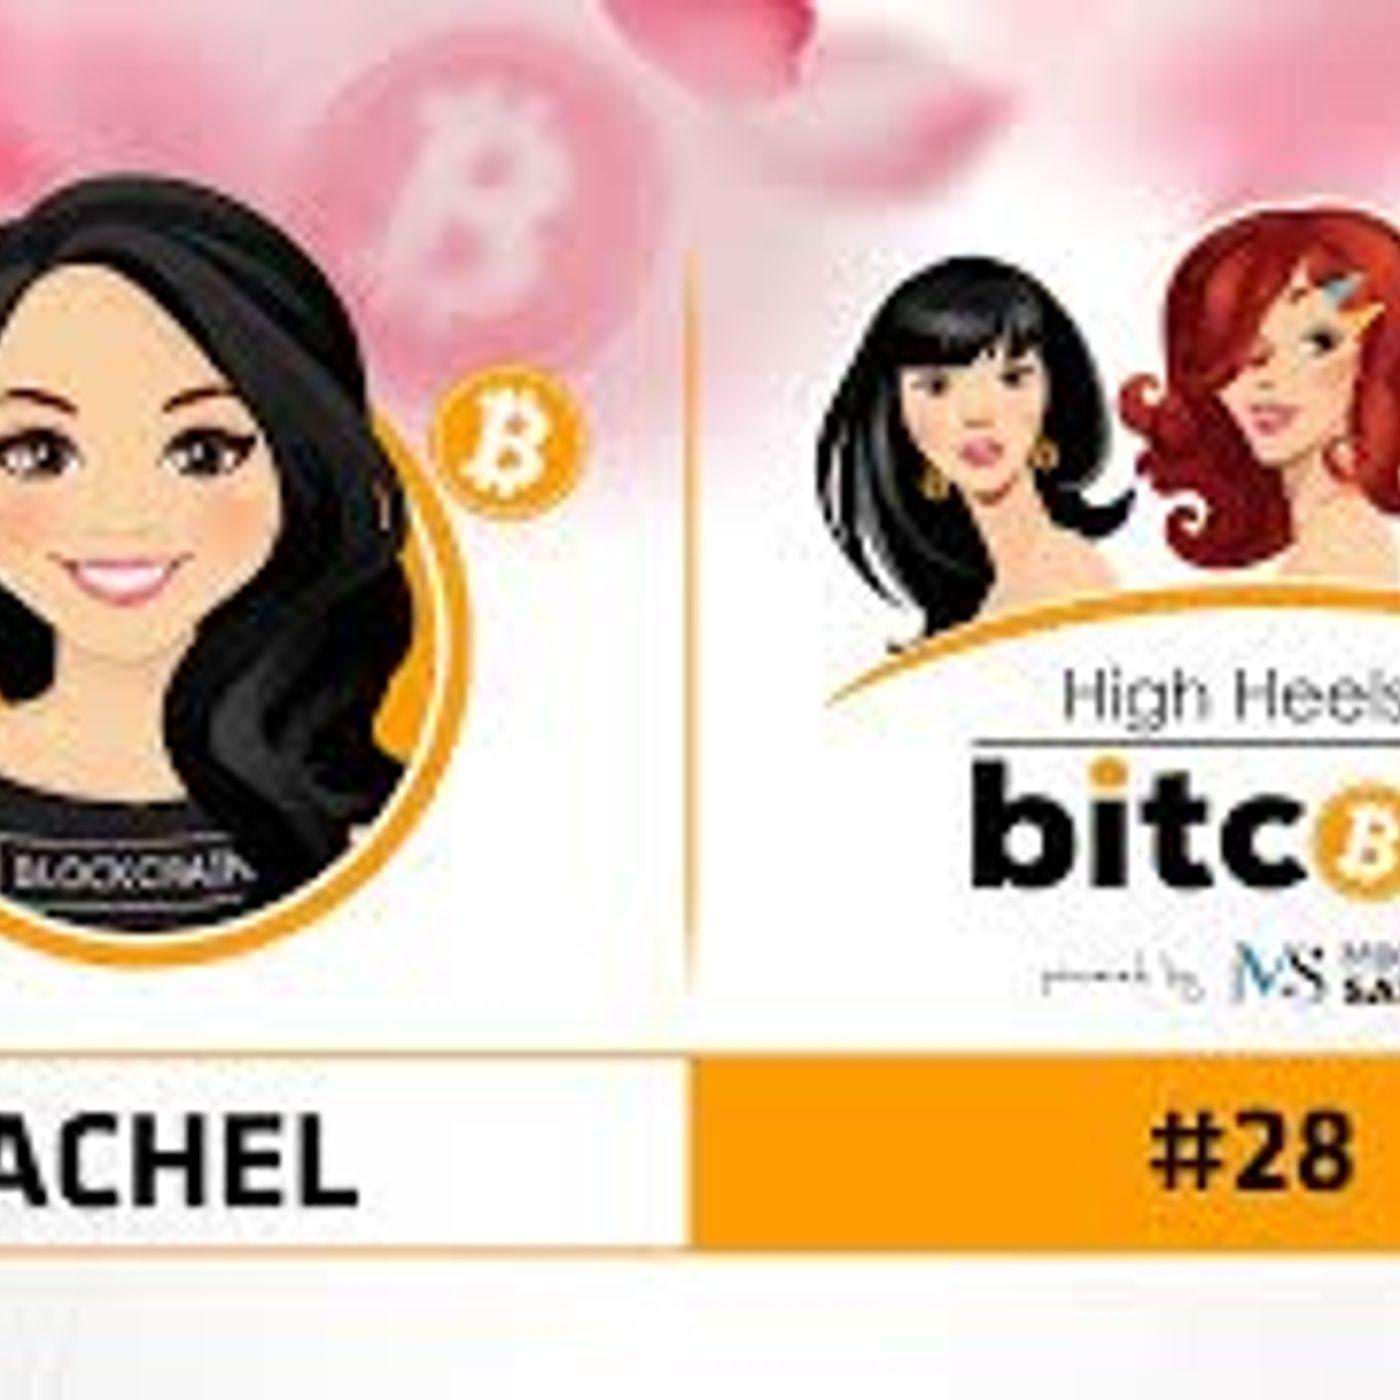 High Heels of Bitcoin #28 | Rachel (@CryptoFinally)